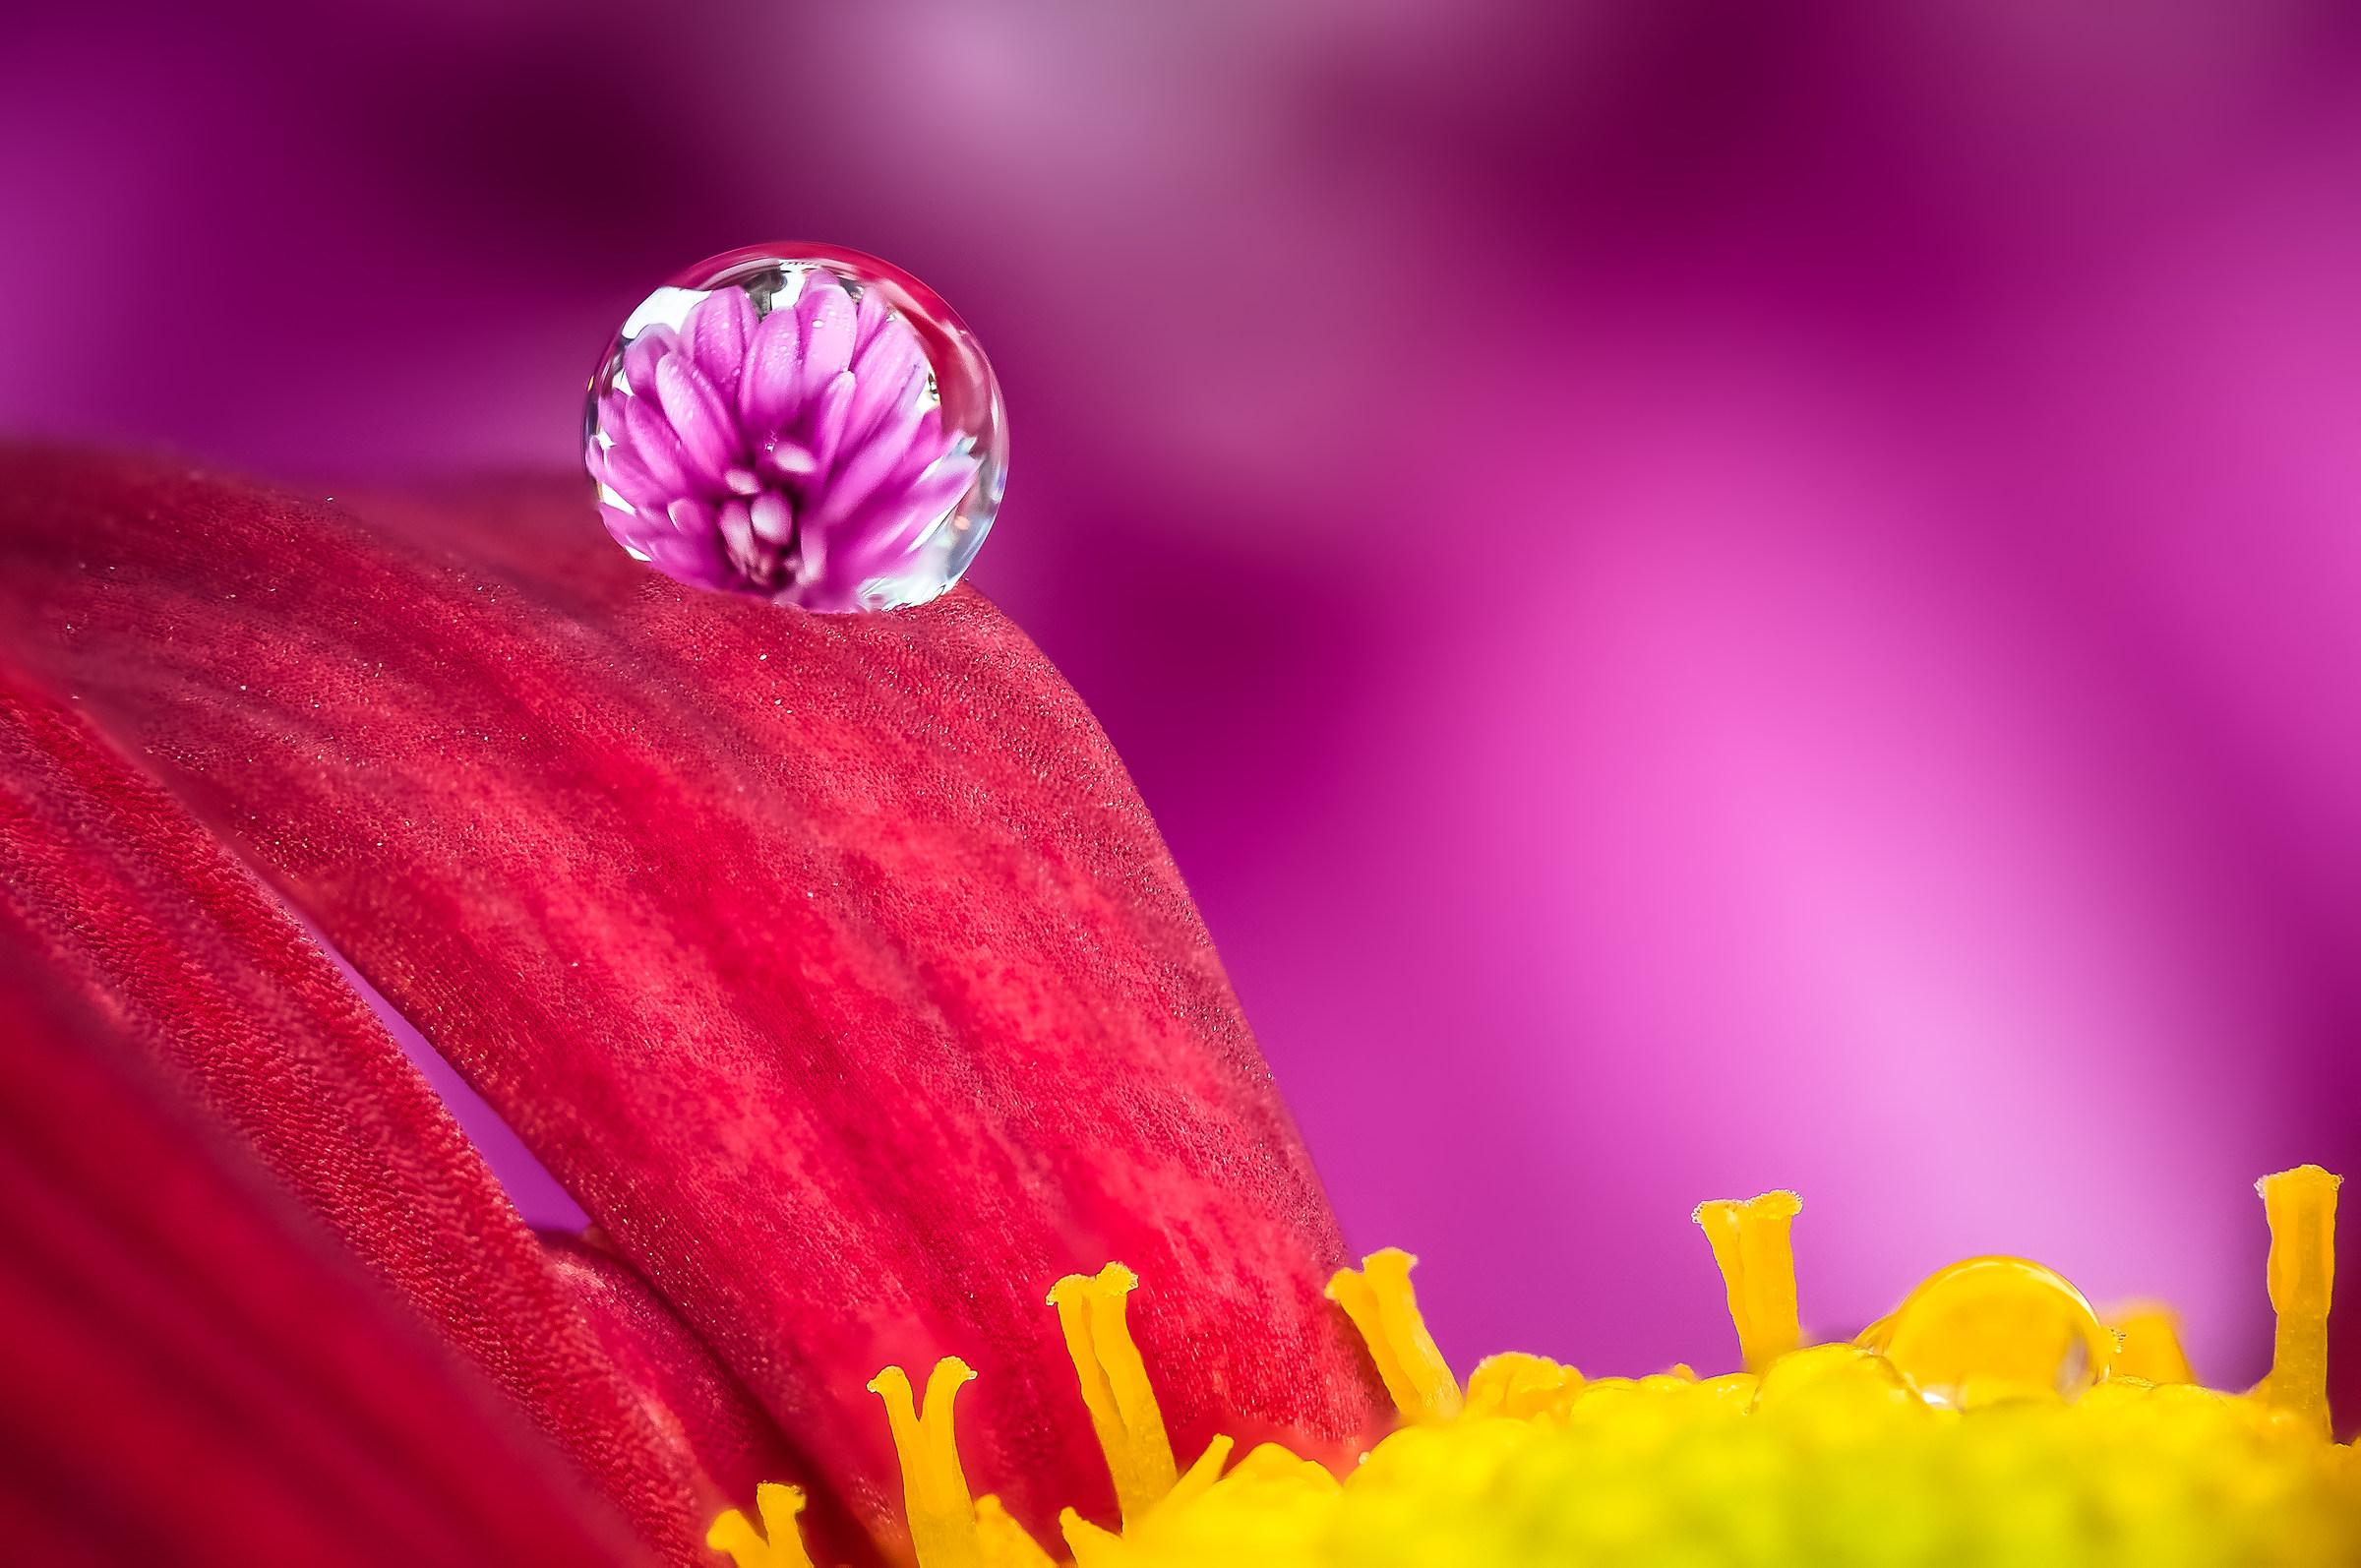 Drops Flowers Gocce Fiori Riflessi Mario jr Nicorelli...